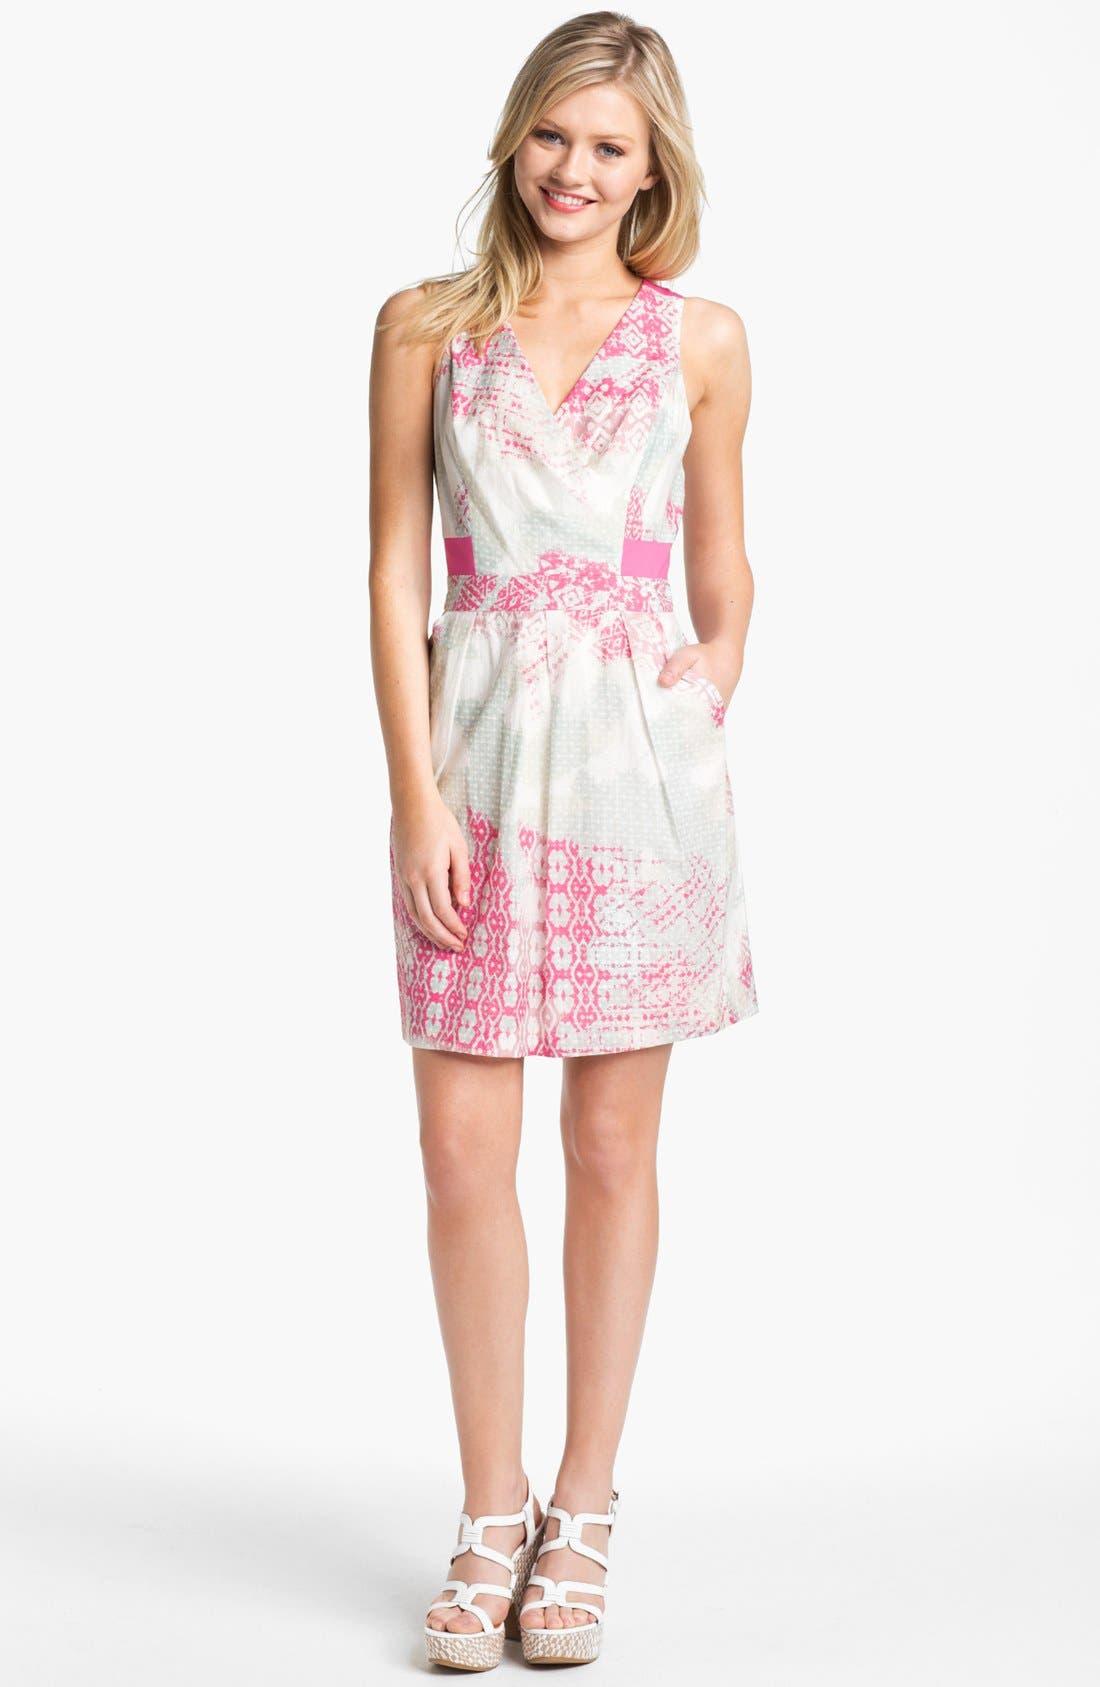 Main Image - Jessica Simpson Print Cotton Dress